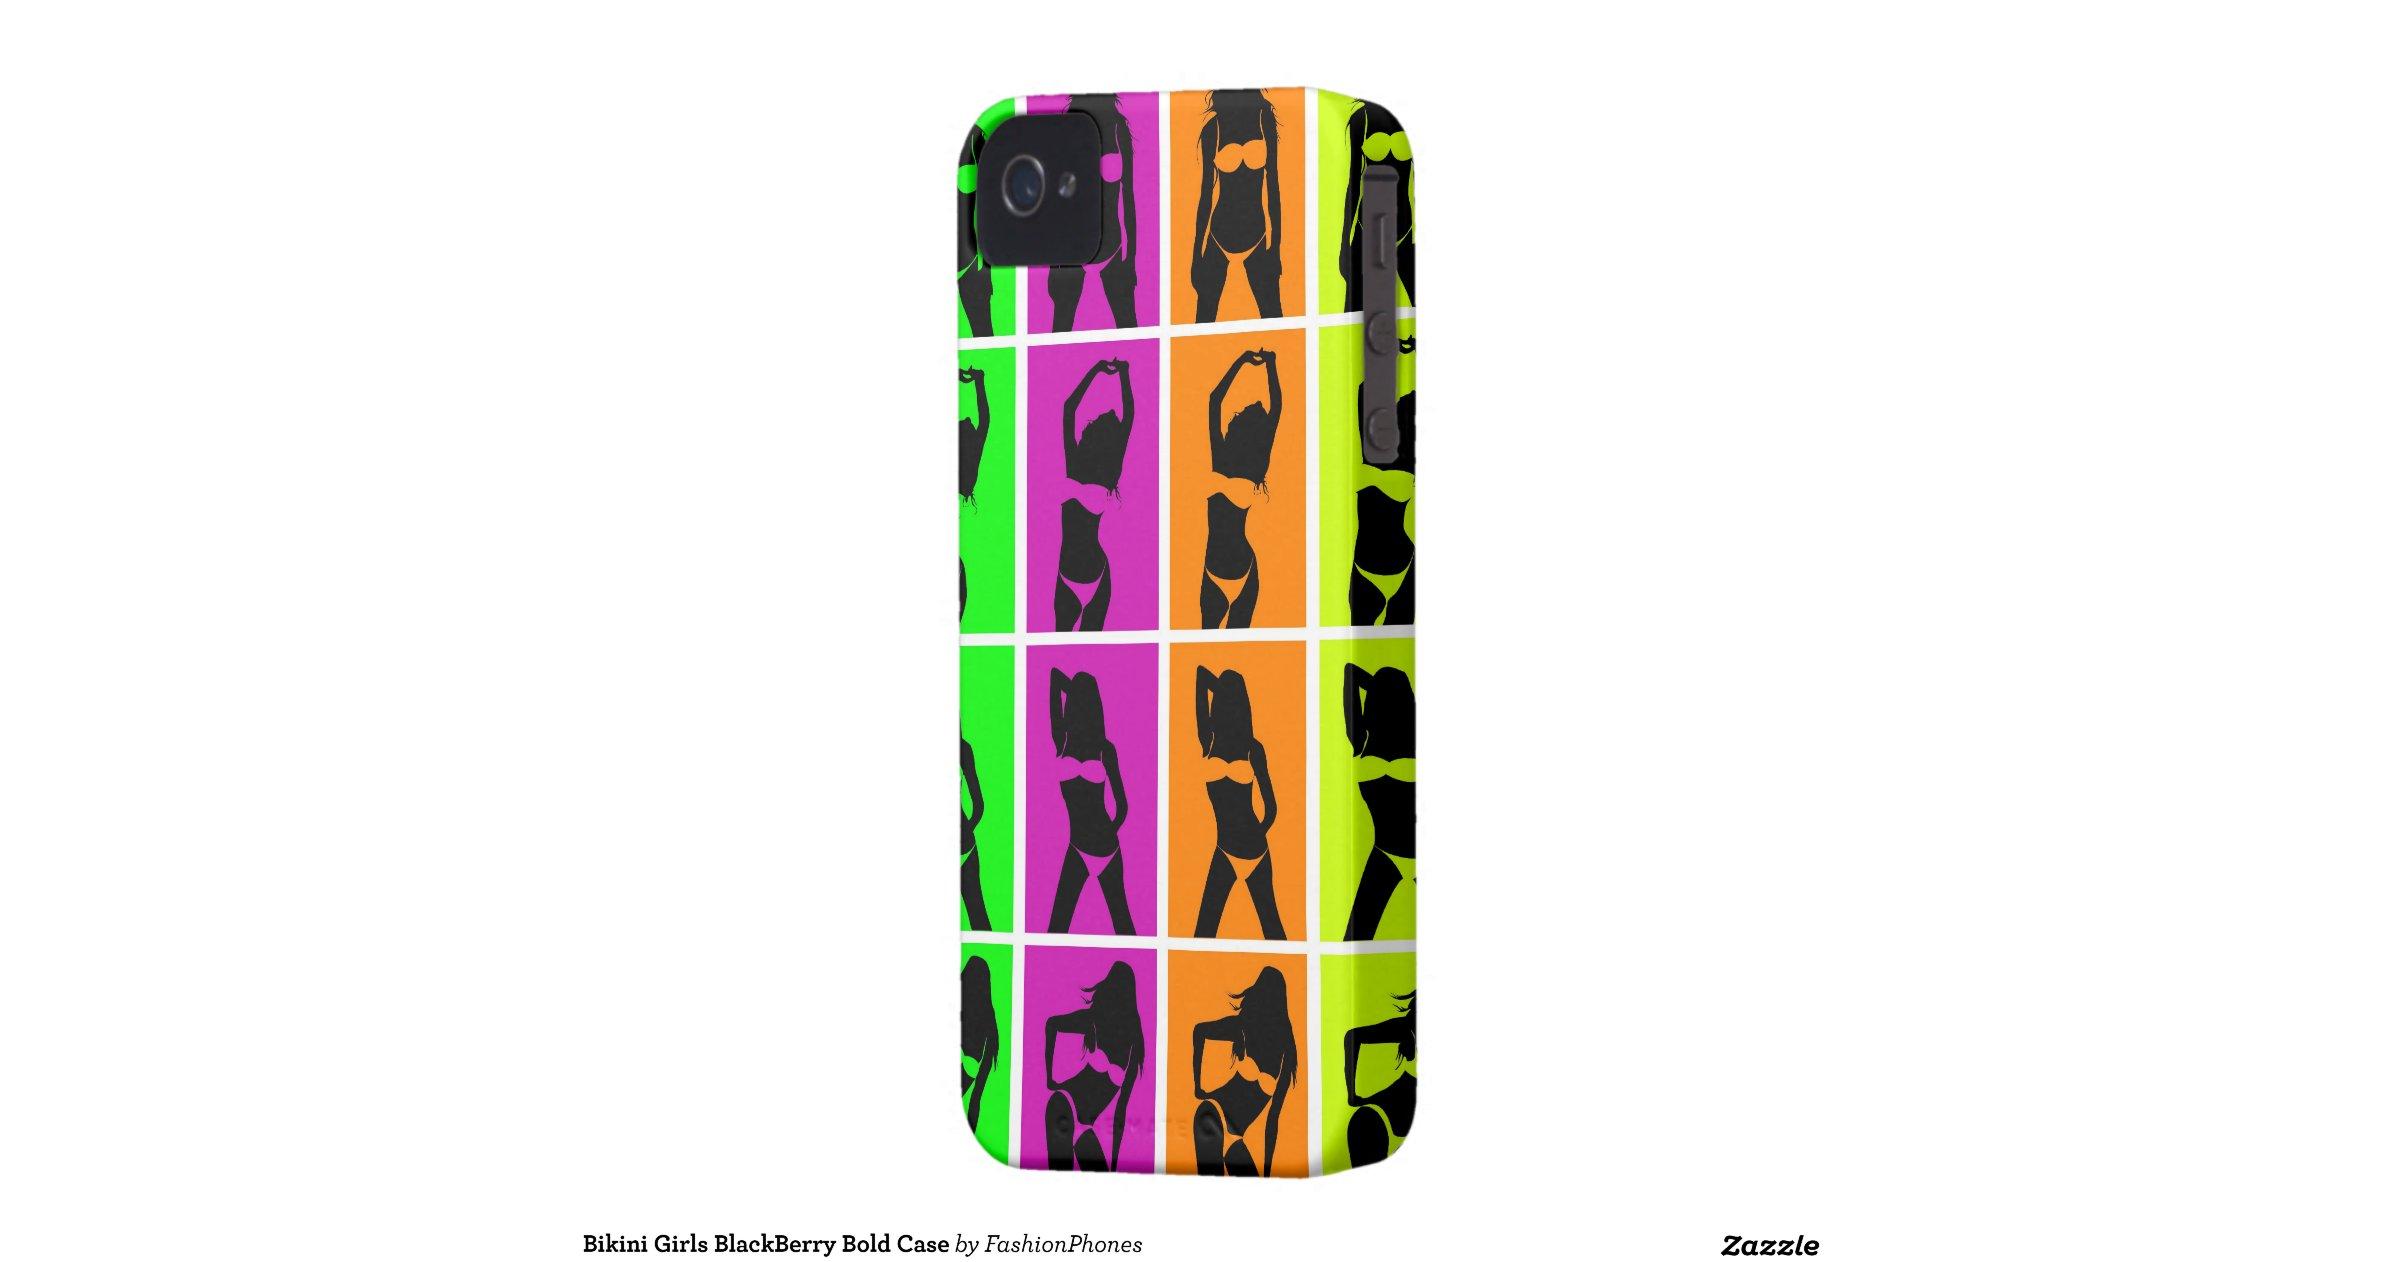 bikini girls blackberry bold case